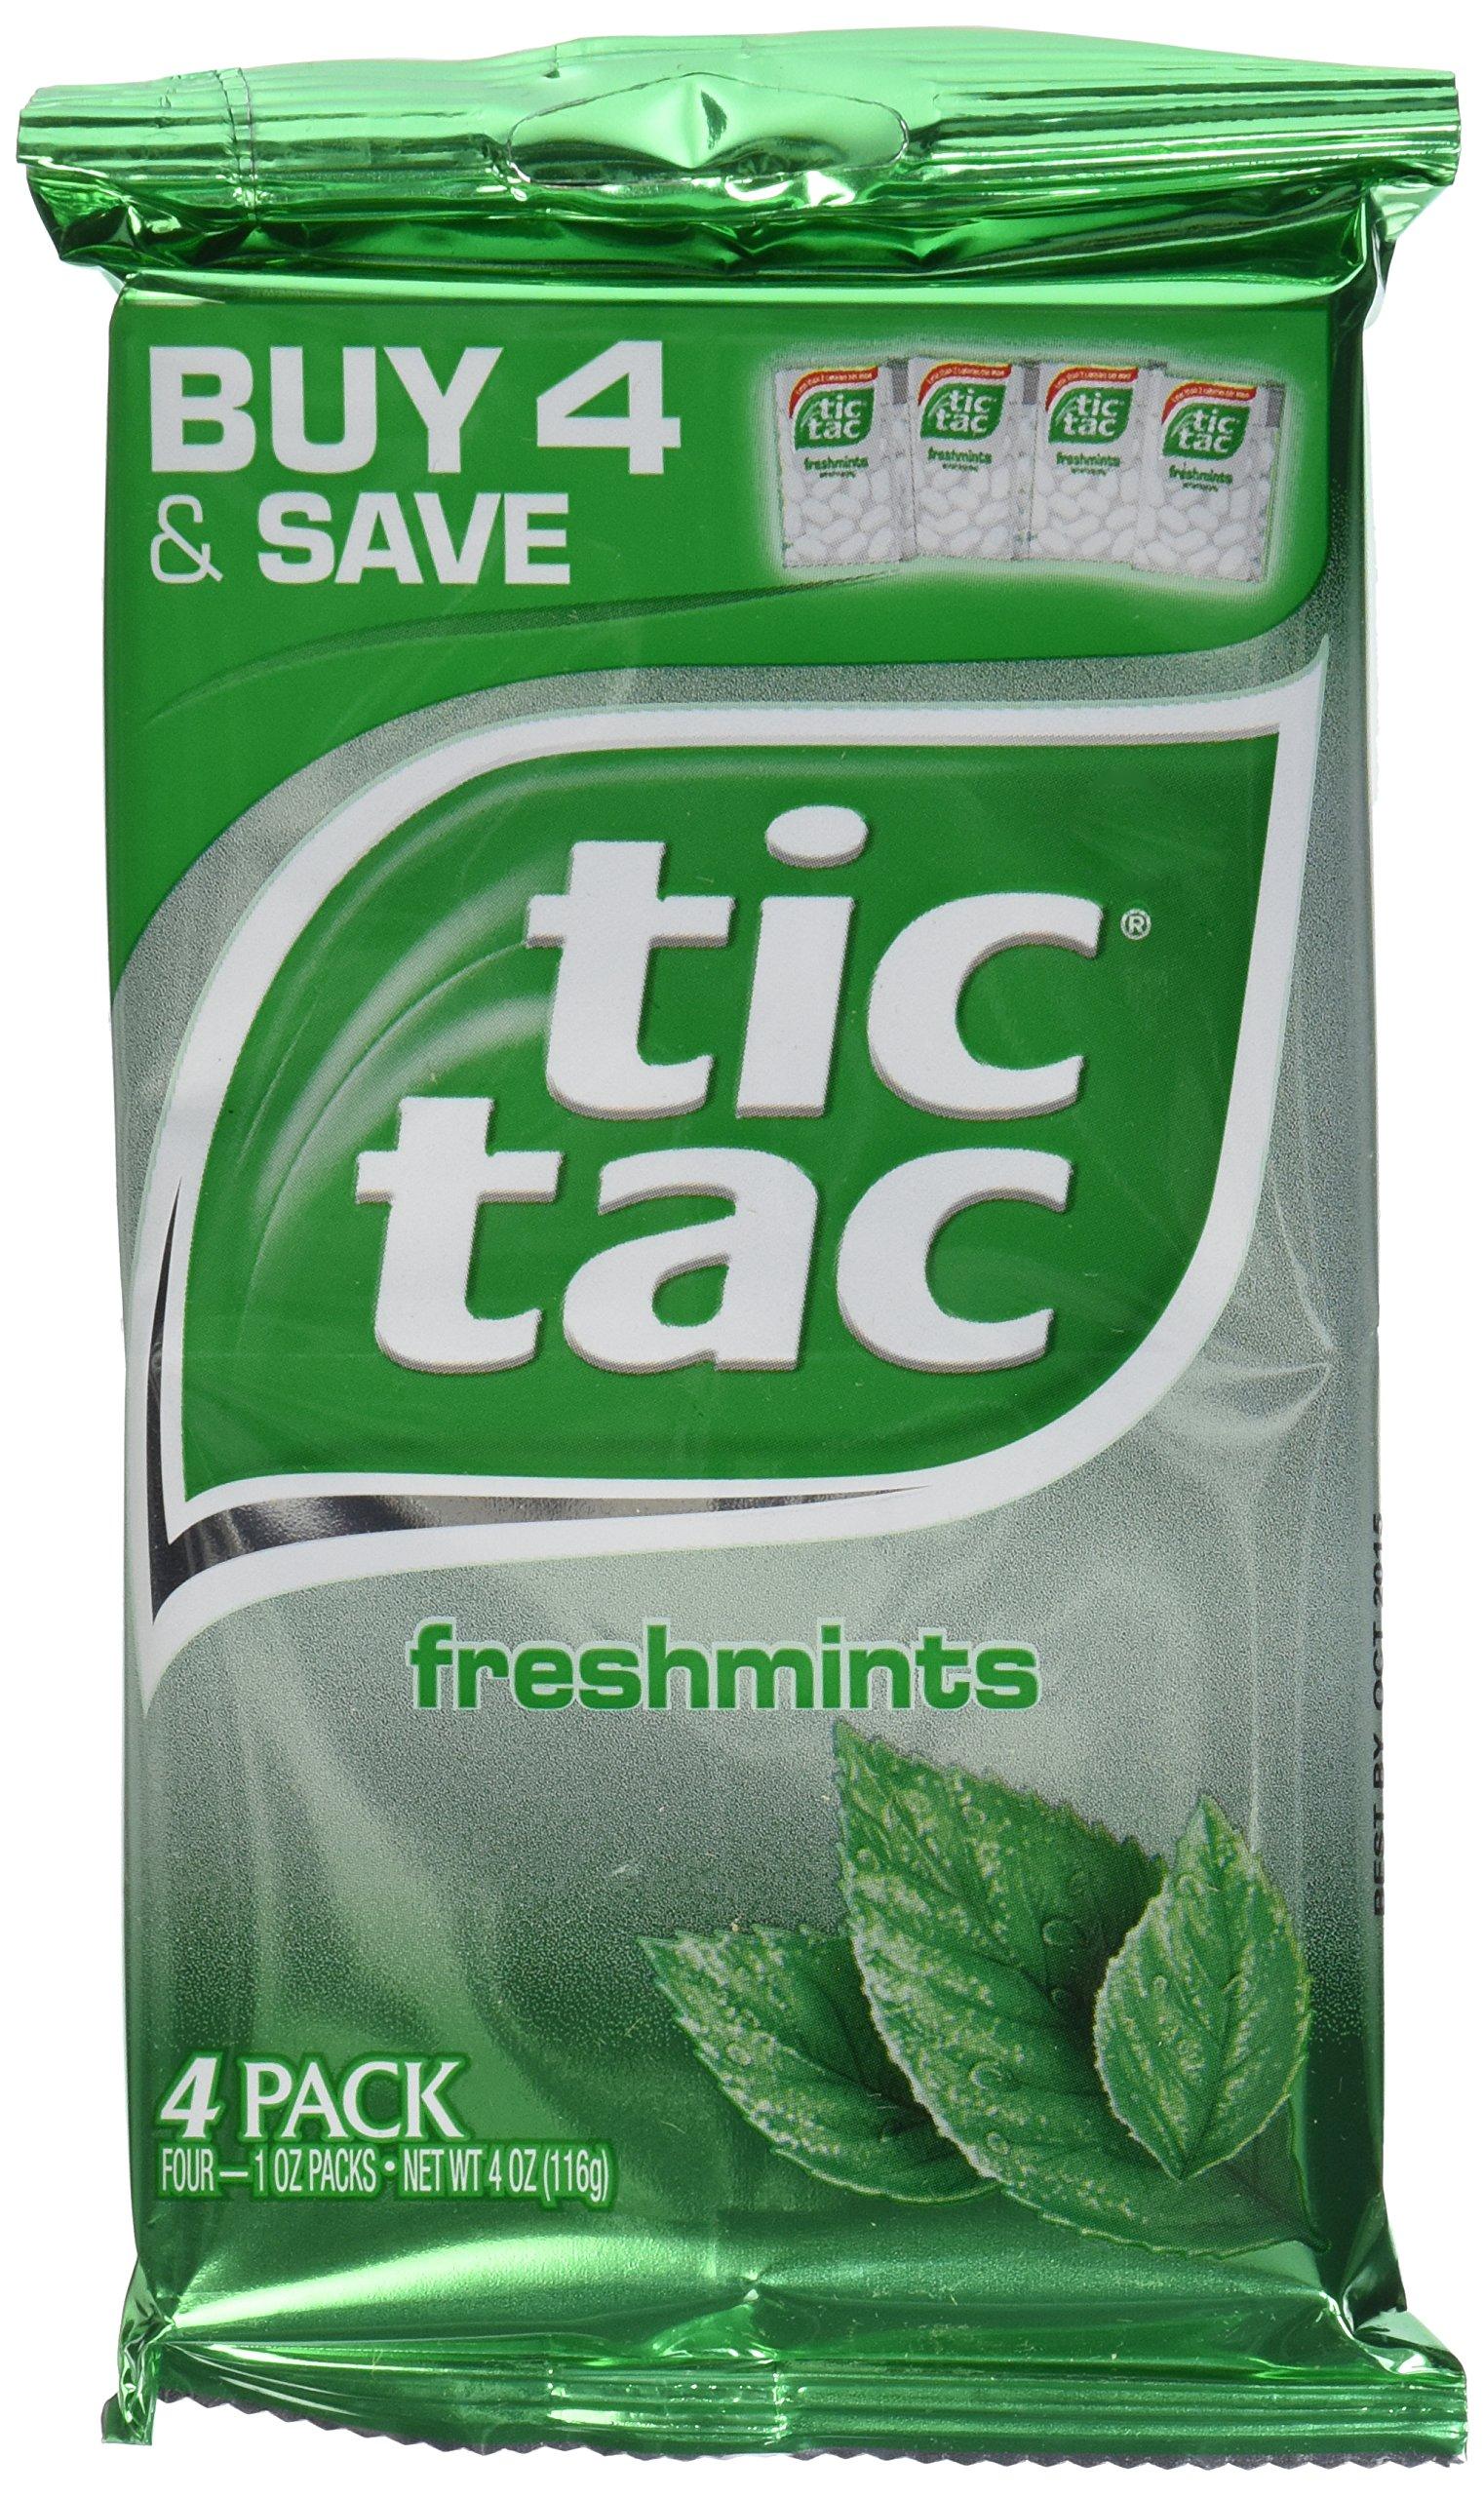 Tic Tac Chewing Gum, Freshmint, 4.0 oz (4 PK)